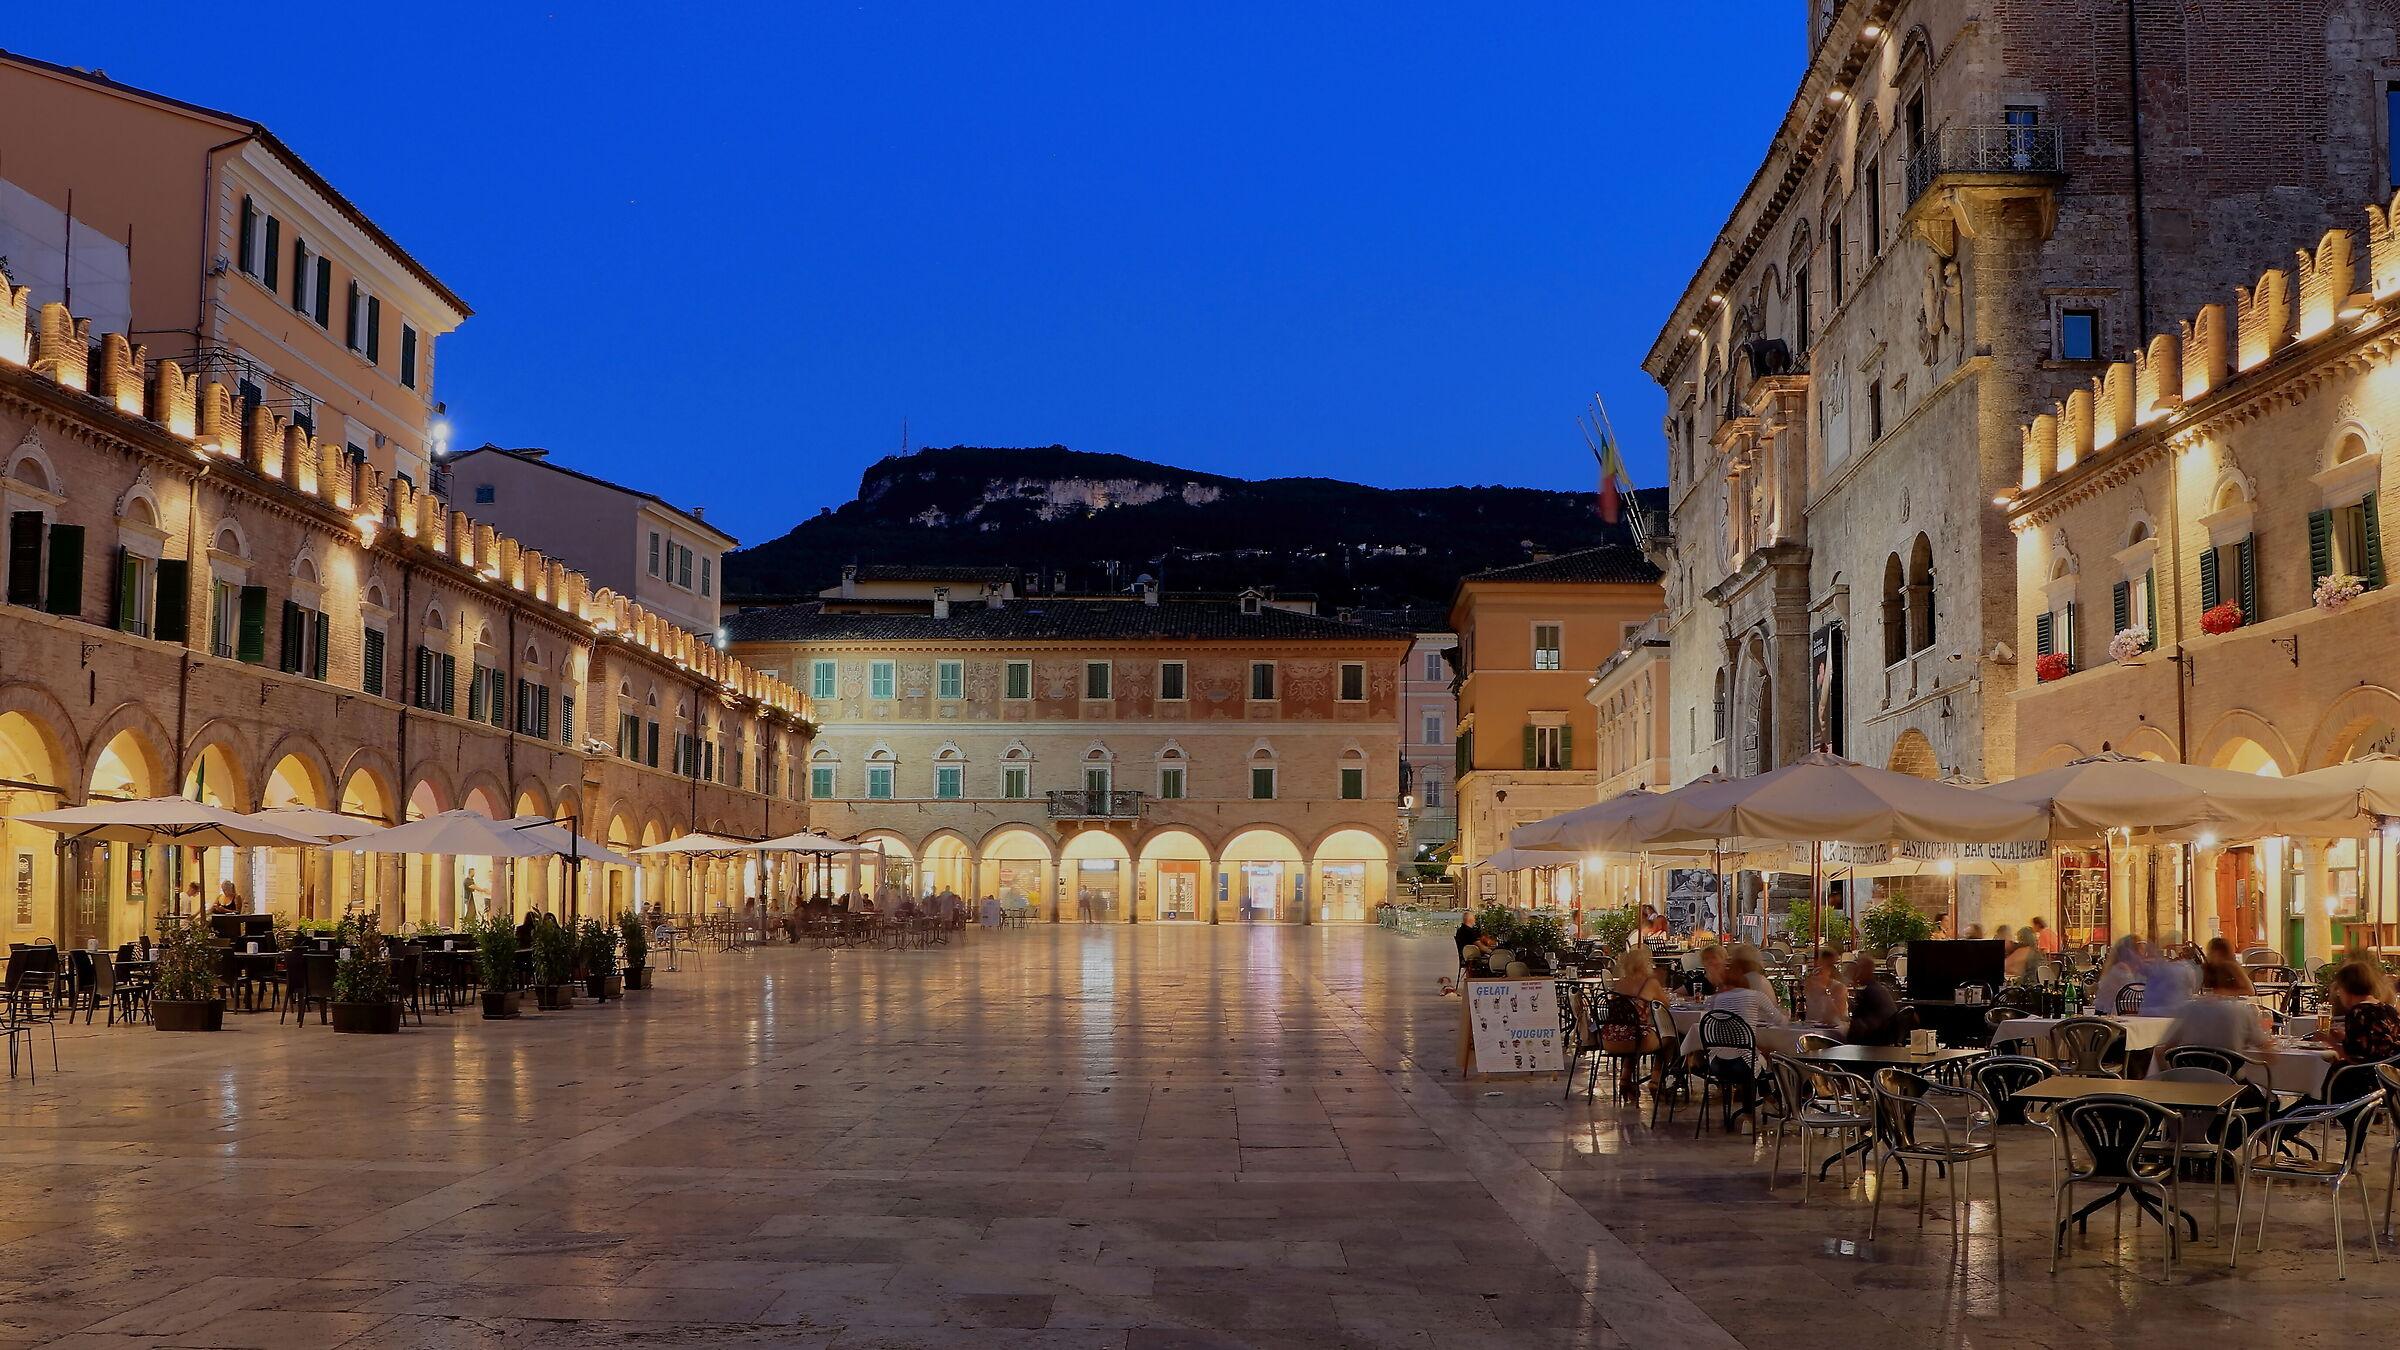 The lights of Piazza del Popolo...